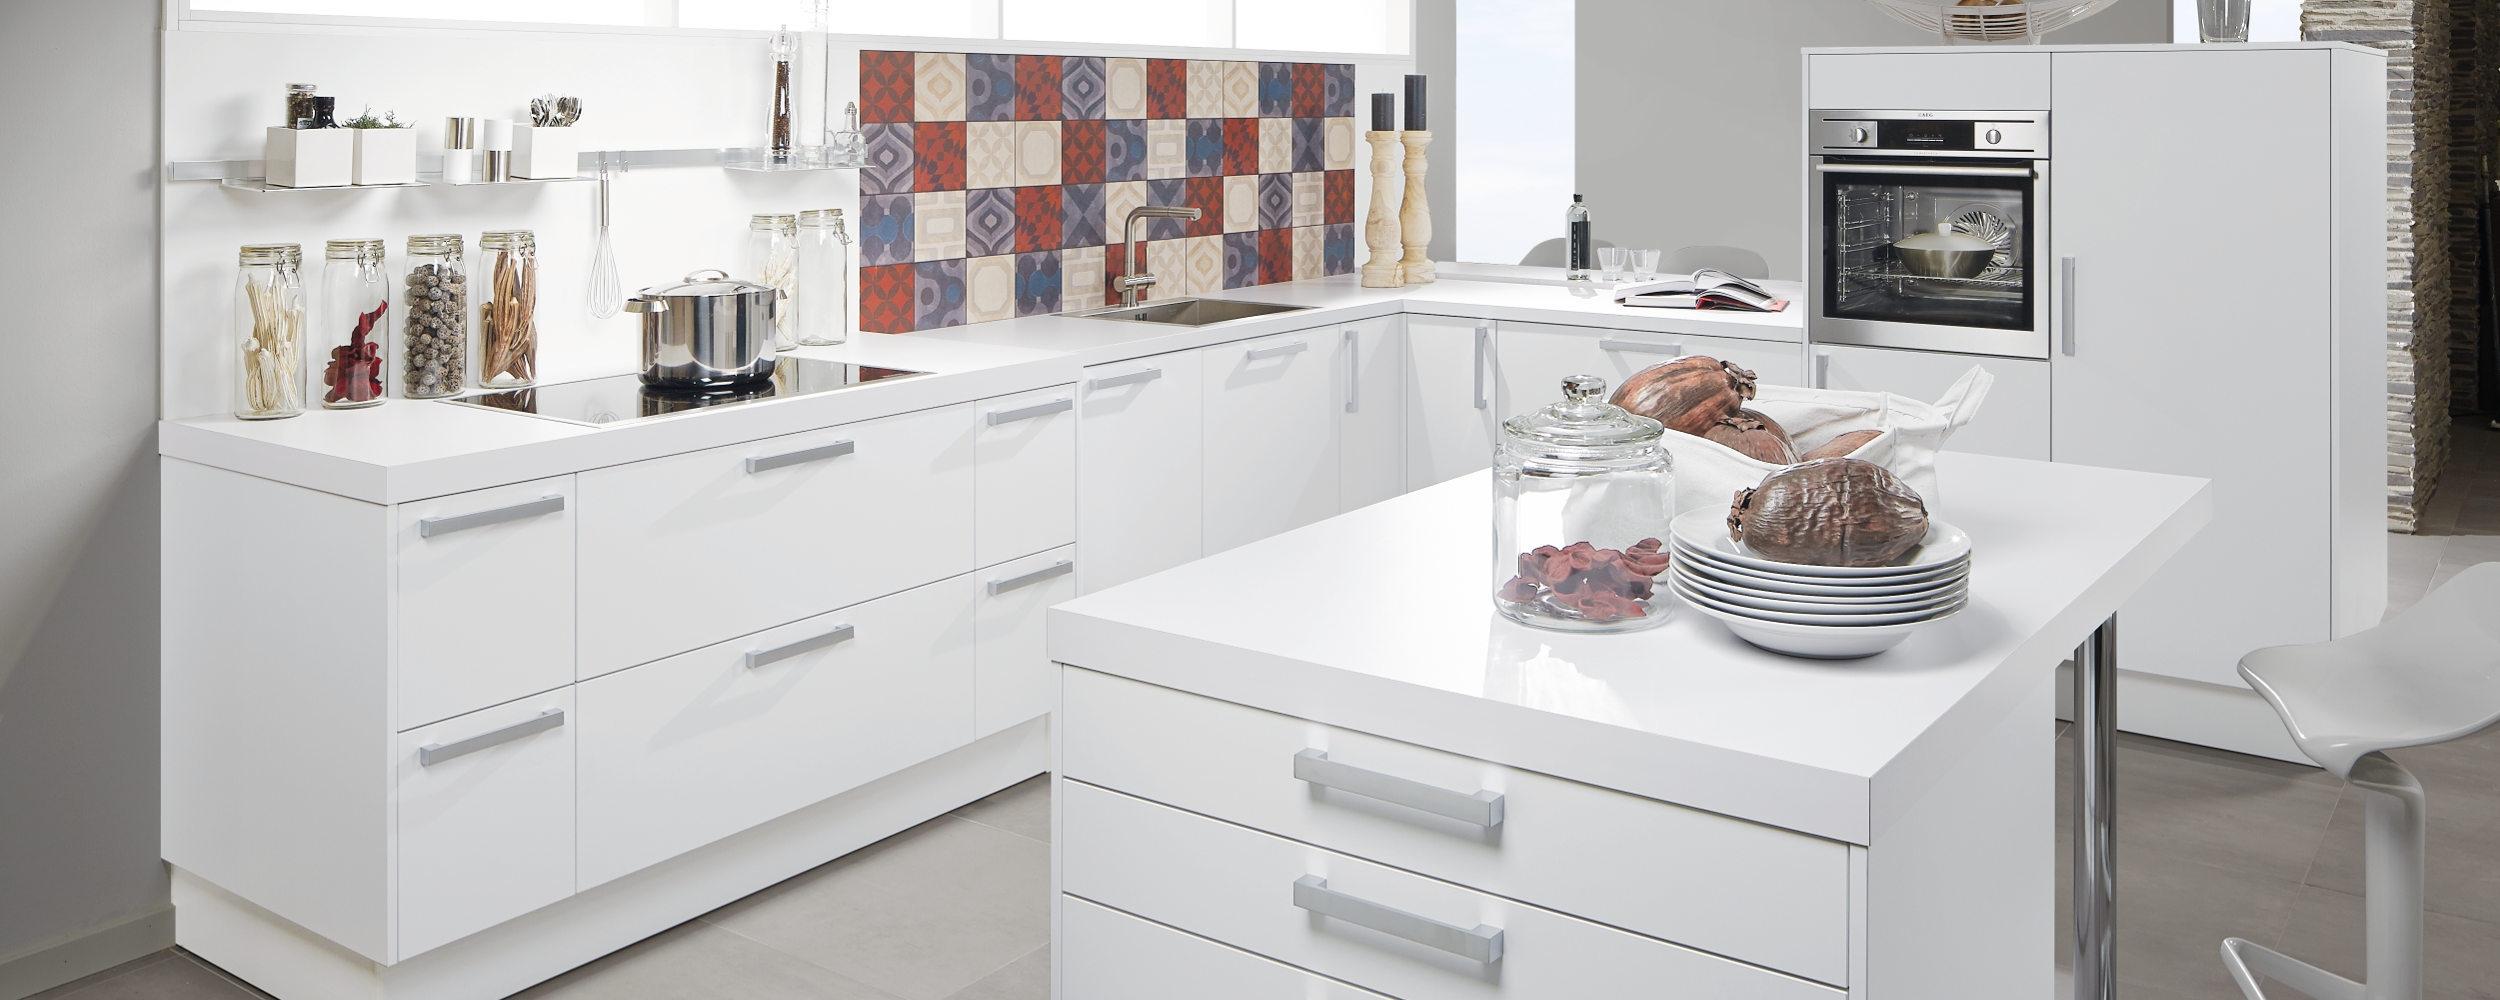 Pronorm Classicline Kitchens | Pronorm Classicline Prices | EKCO